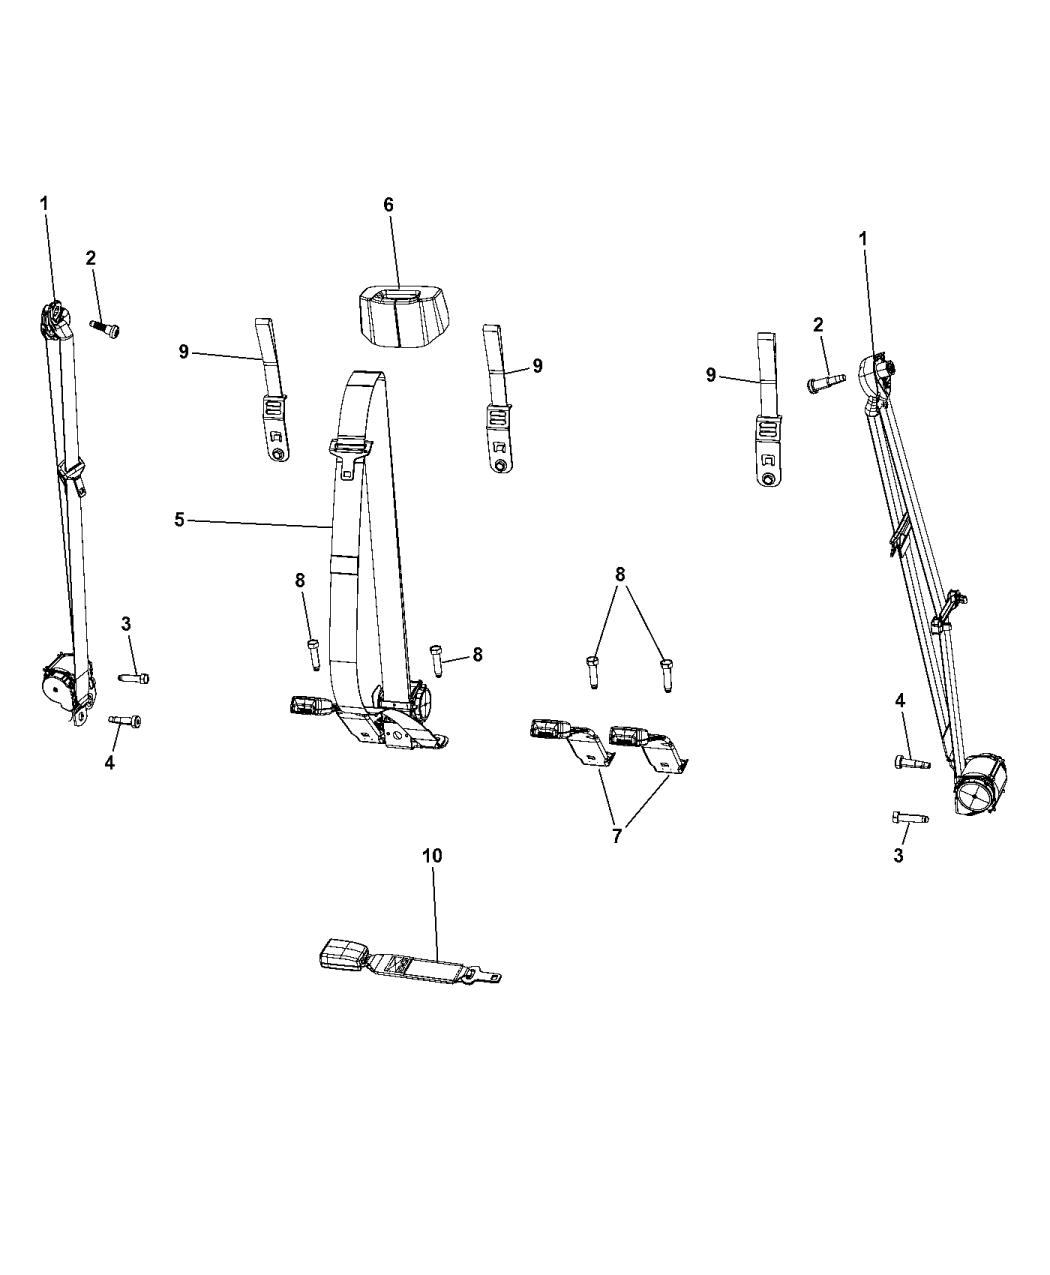 2015 dodge ram 57 hemi belt diagram